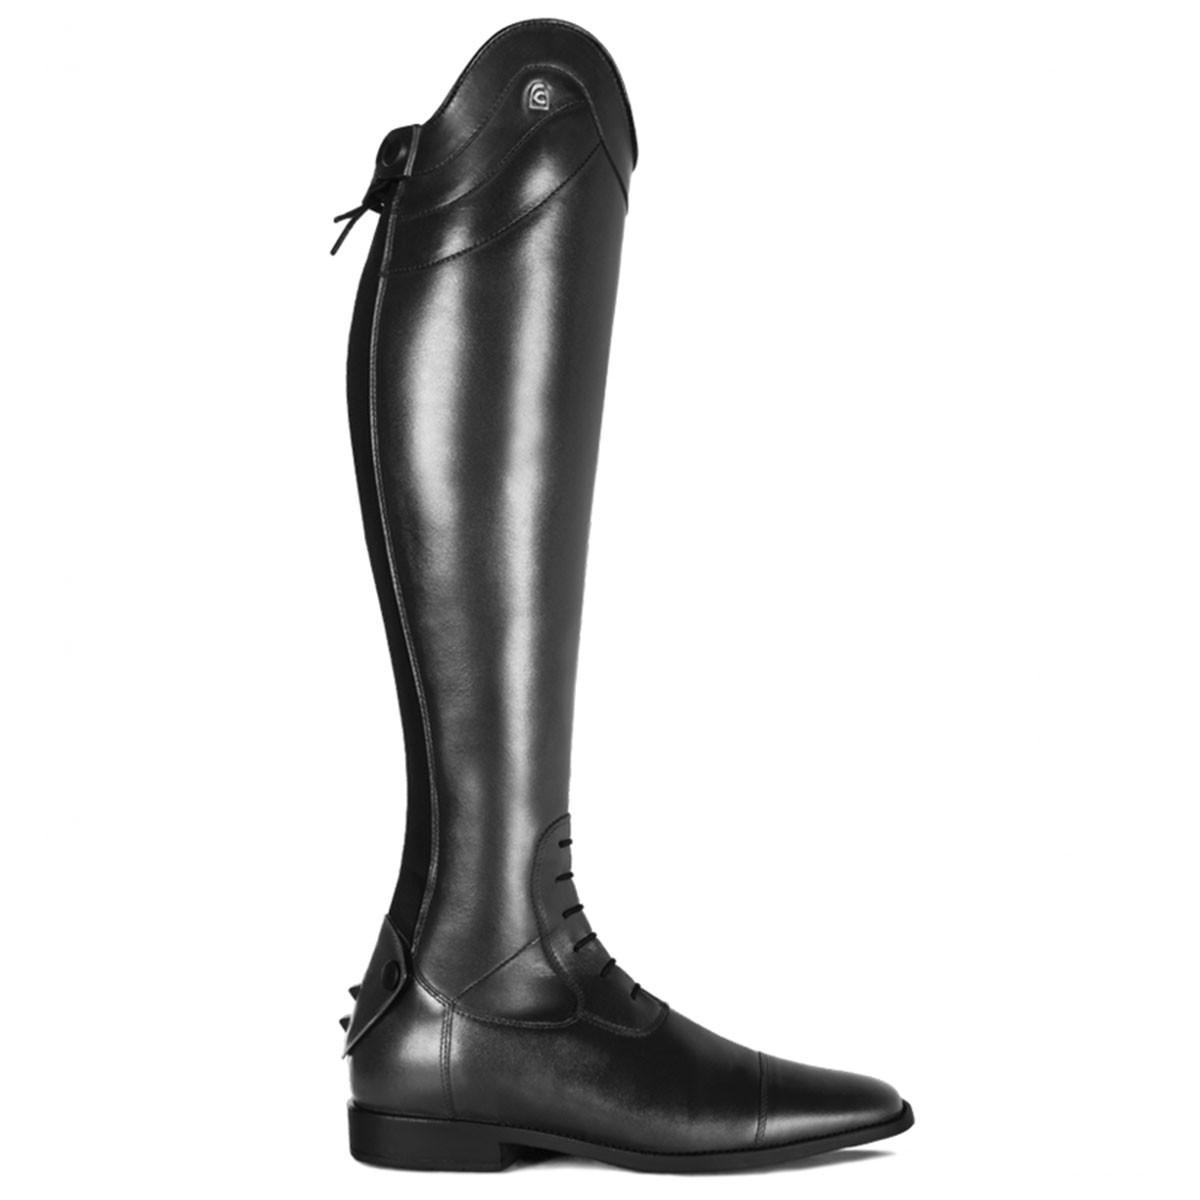 Cavallo Linus Slim rijlaars zwart maat:6-6.5 / h51-w37